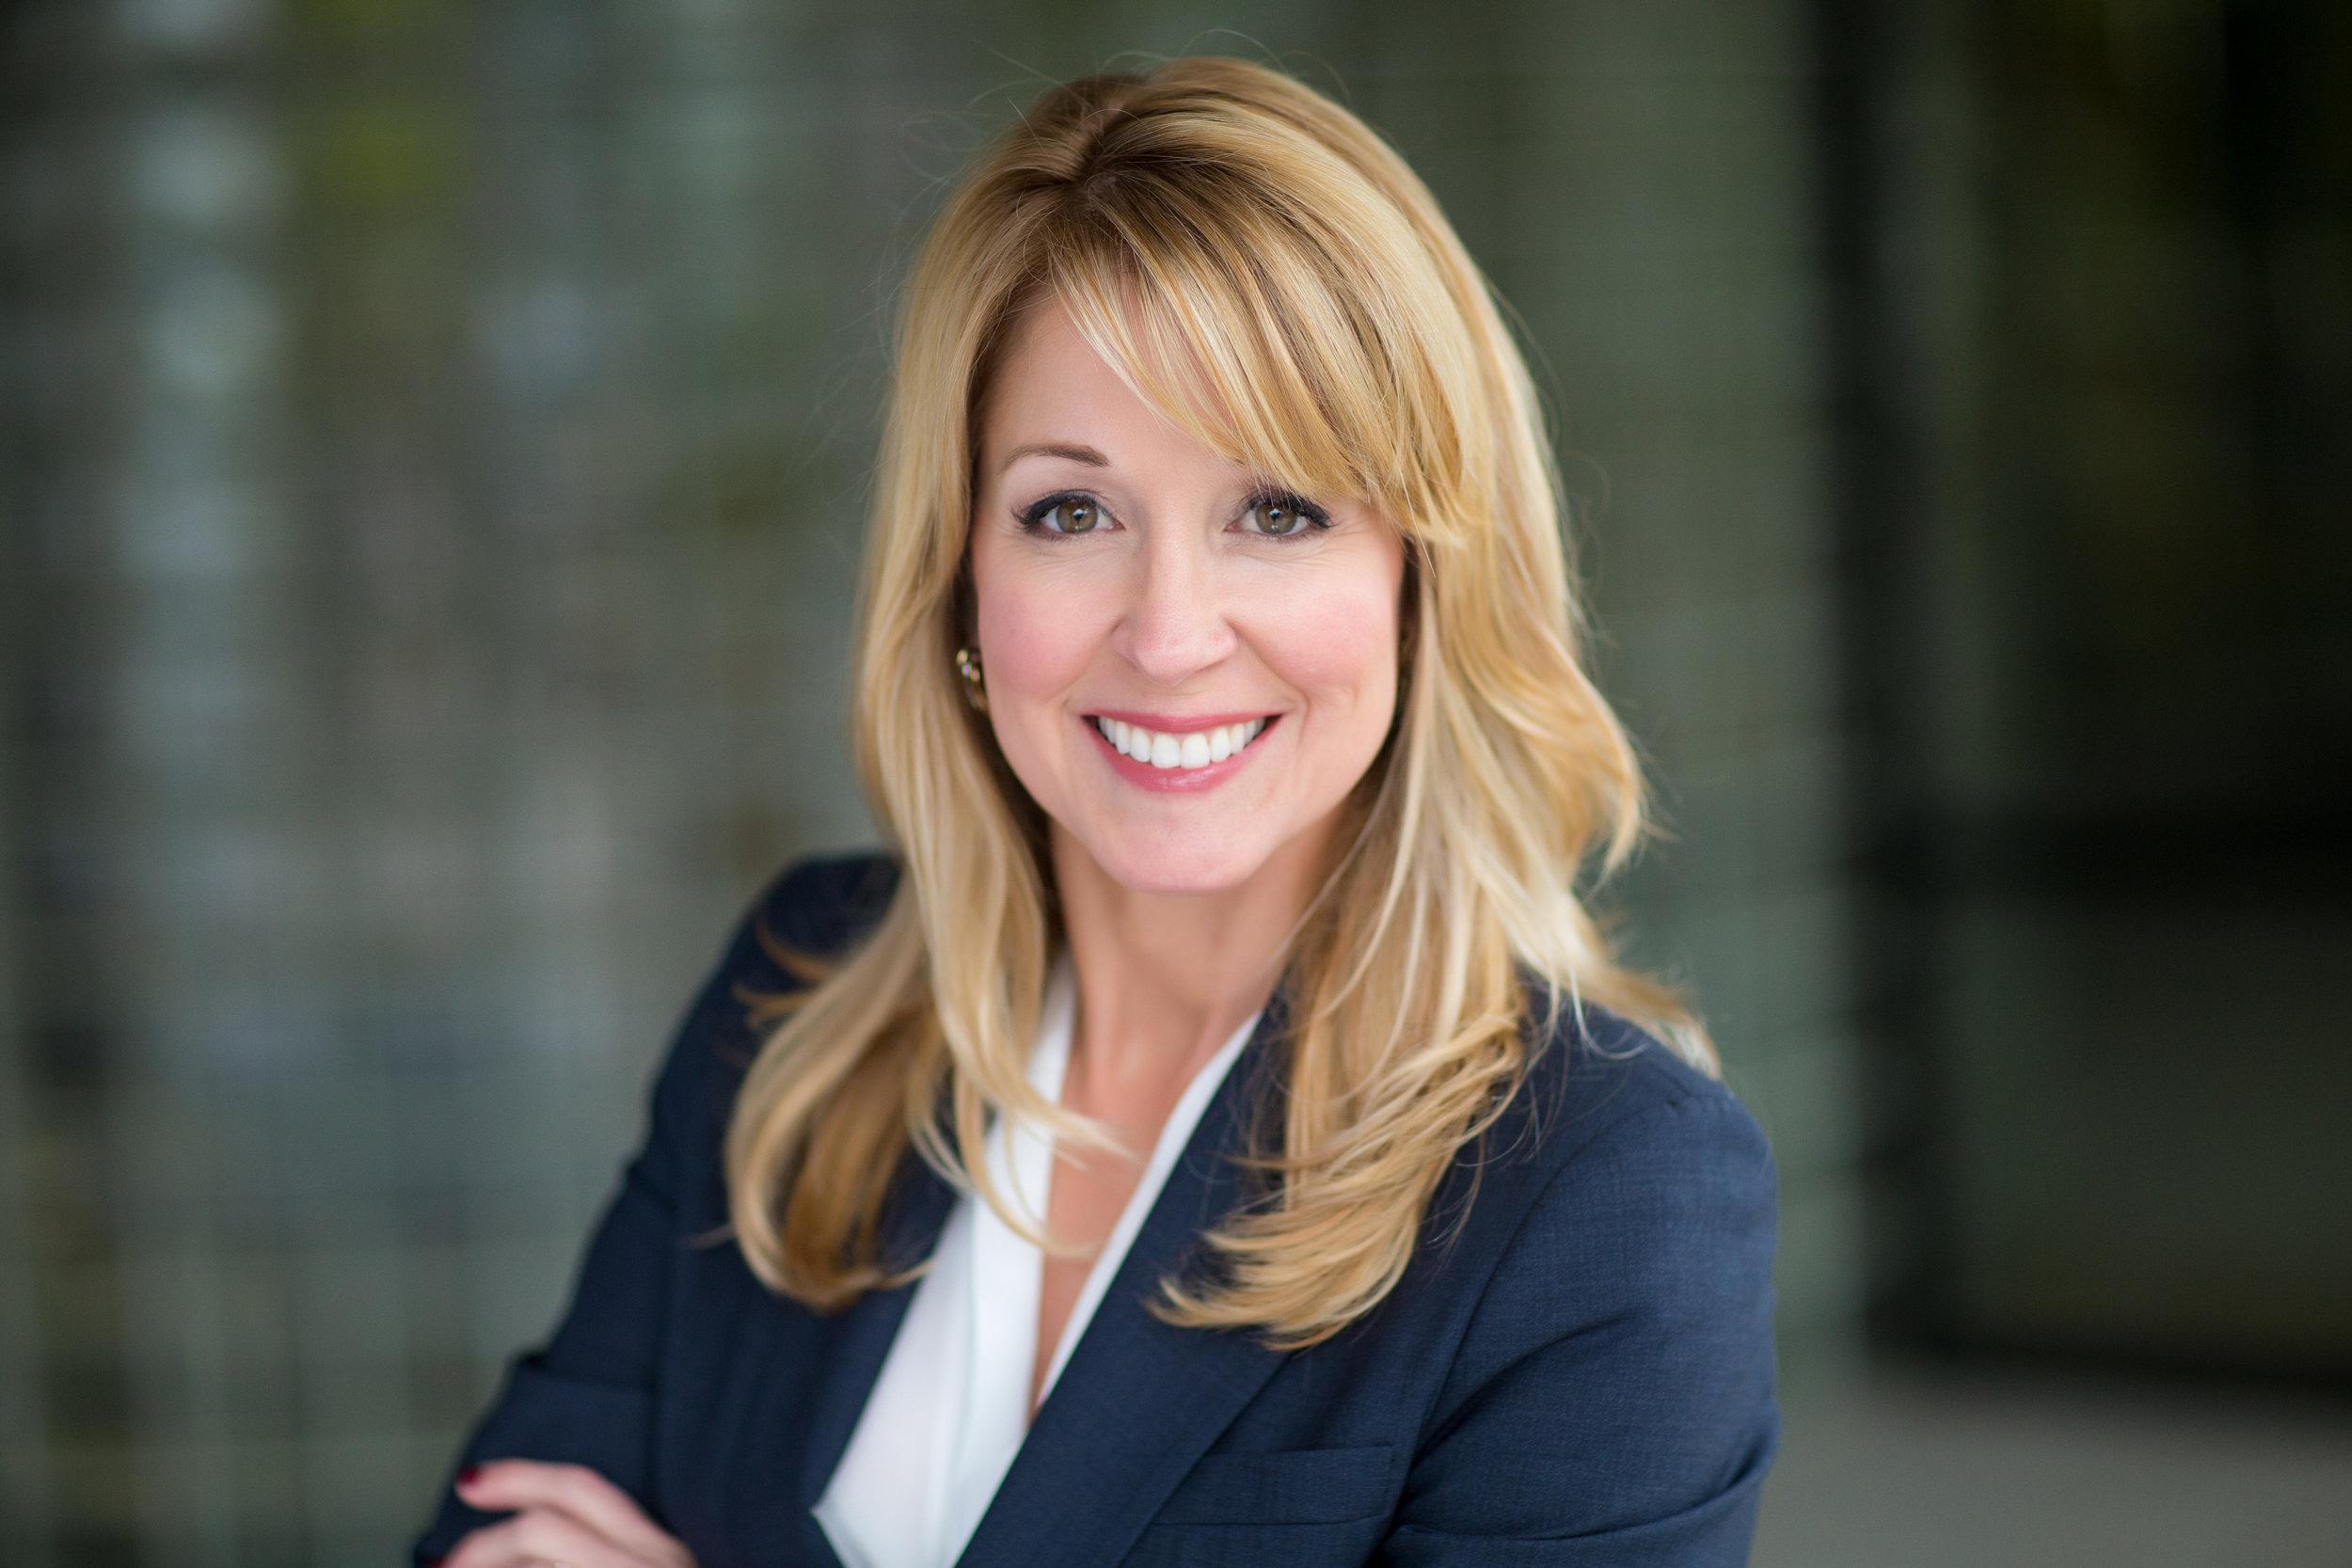 Lisa Michaels, CSR 6361, RPR, CCRR